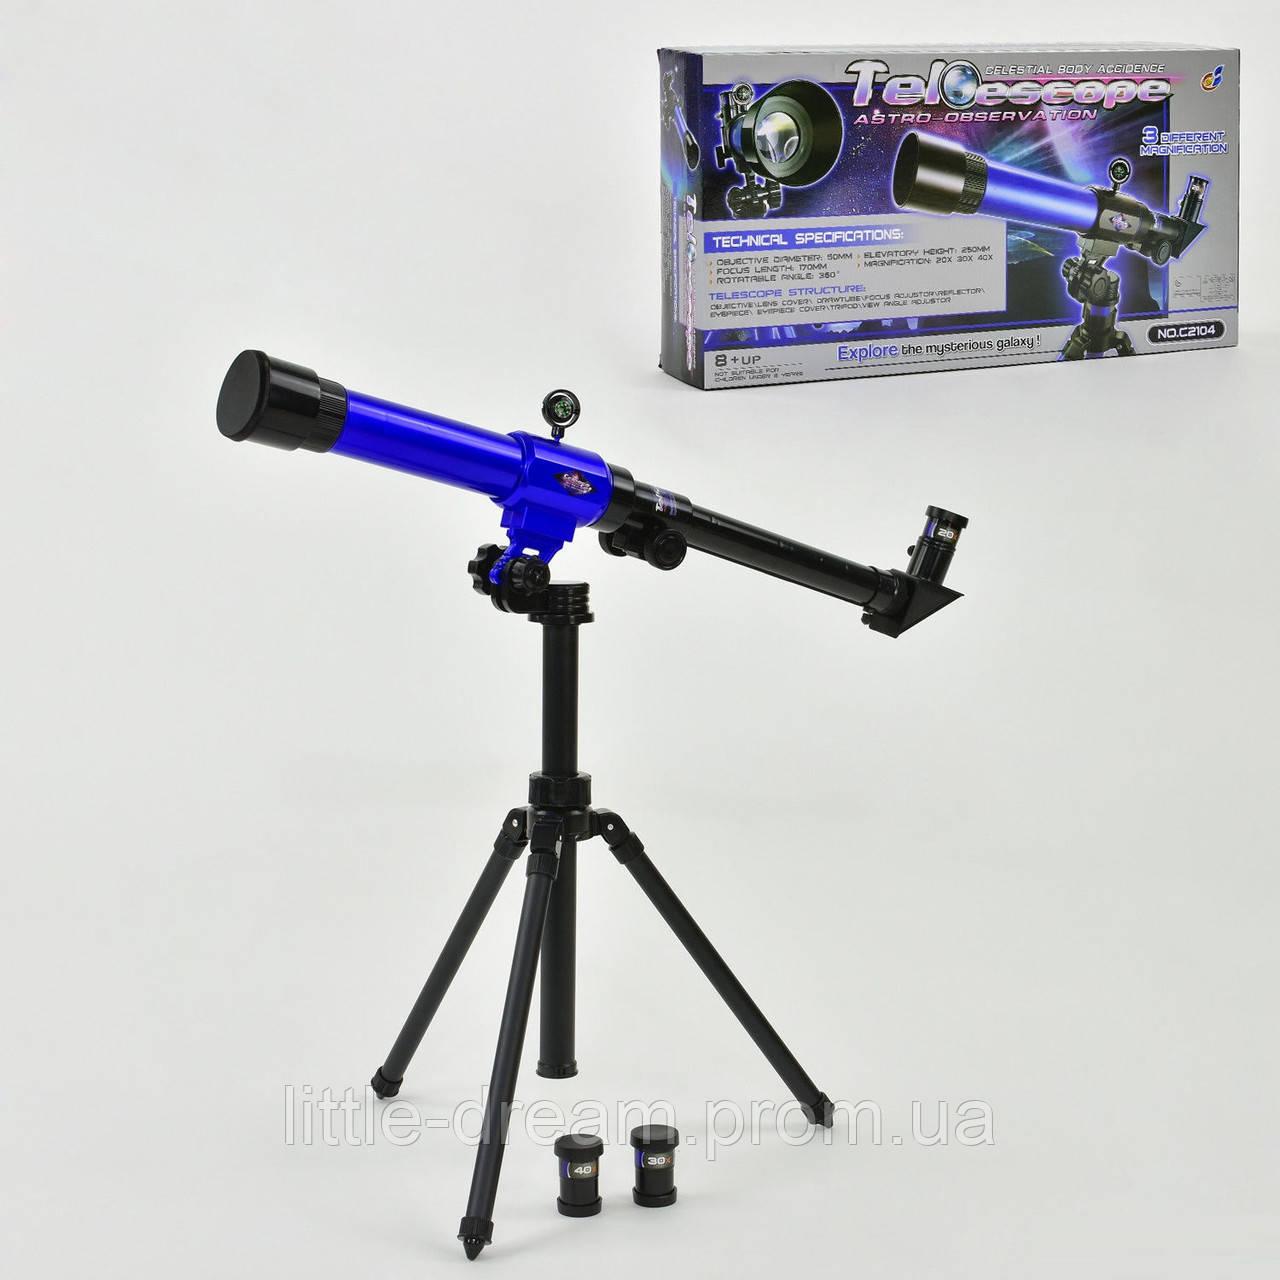 Телескоп С 2104 (3 степени увеличения)